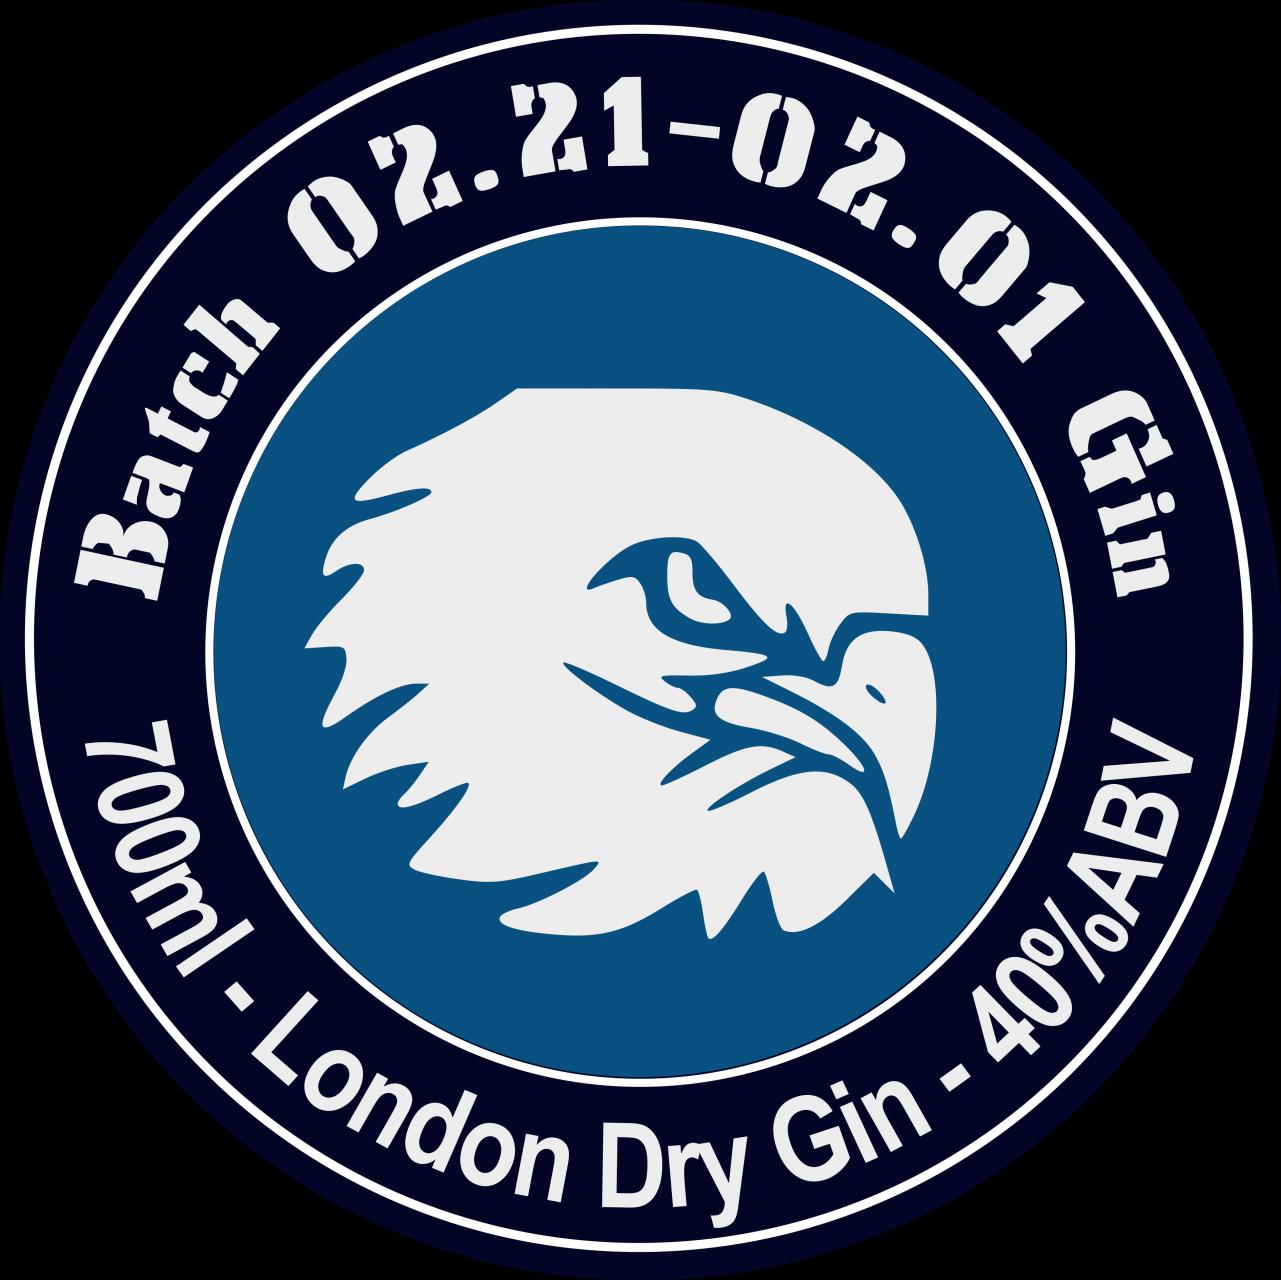 Batch 02.21 - 02.01 Gin